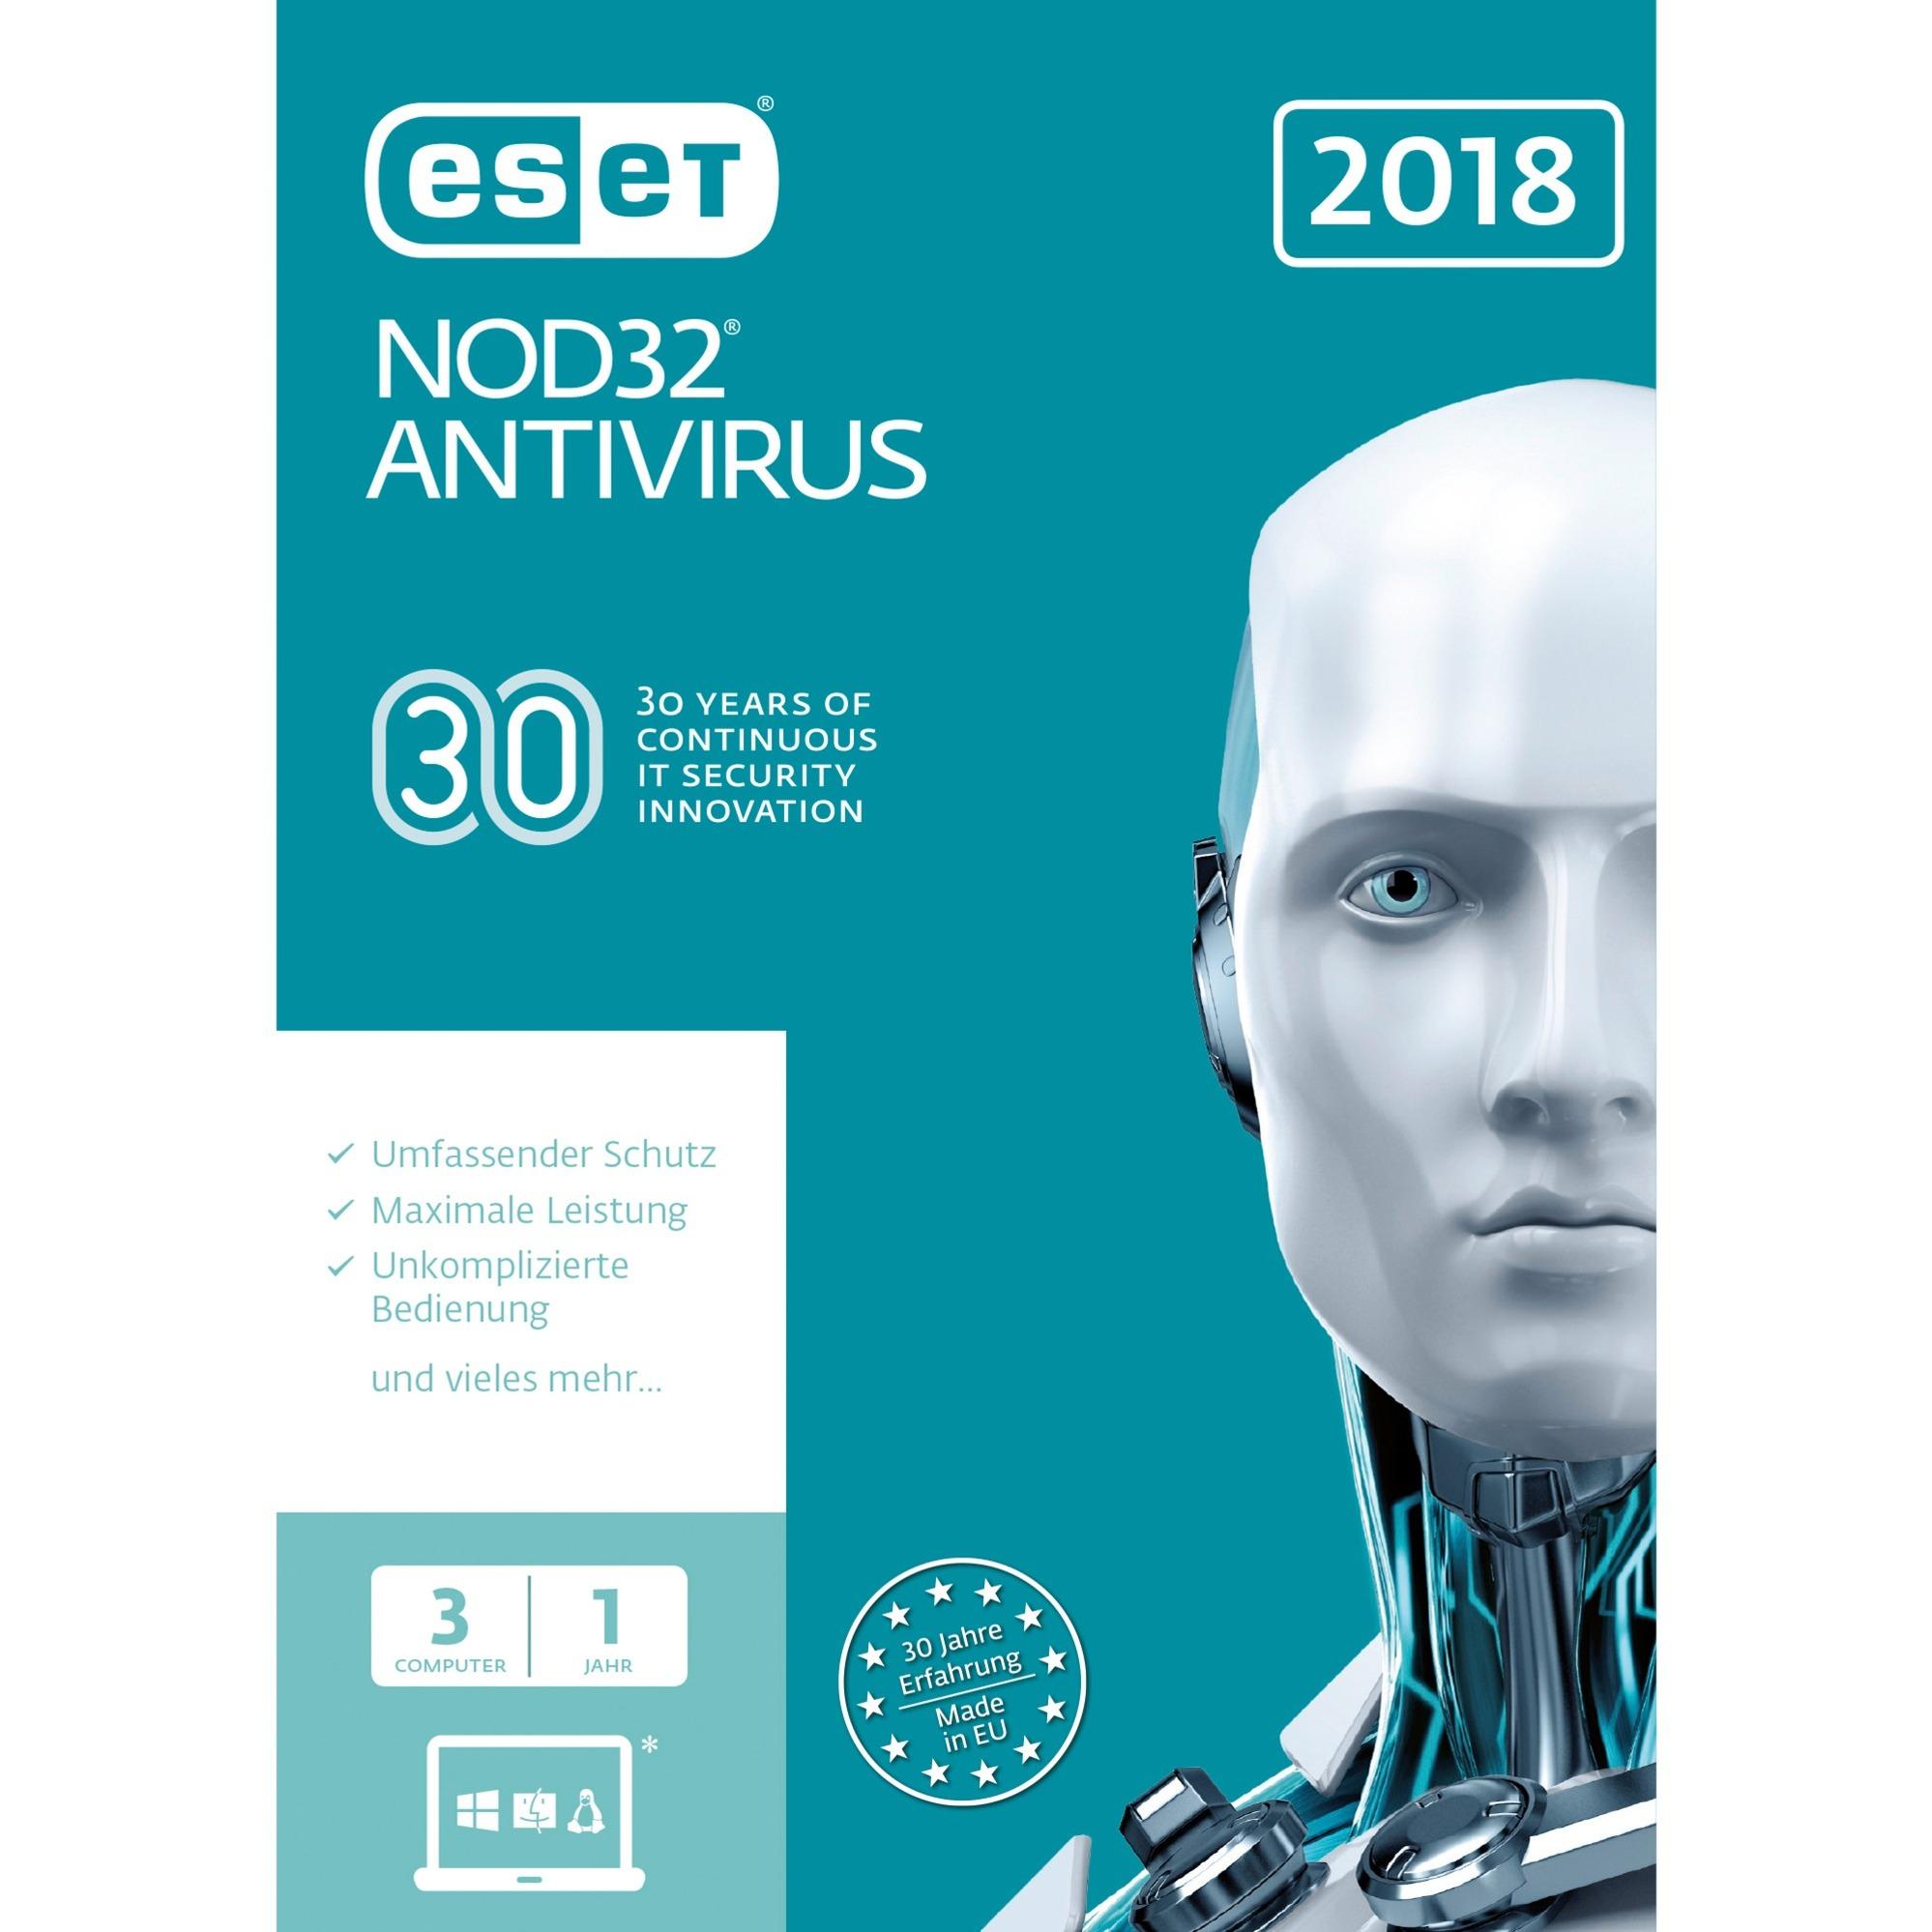 NOD32 Antivirus 2018 3usuario(s) Base license Alemán, Software